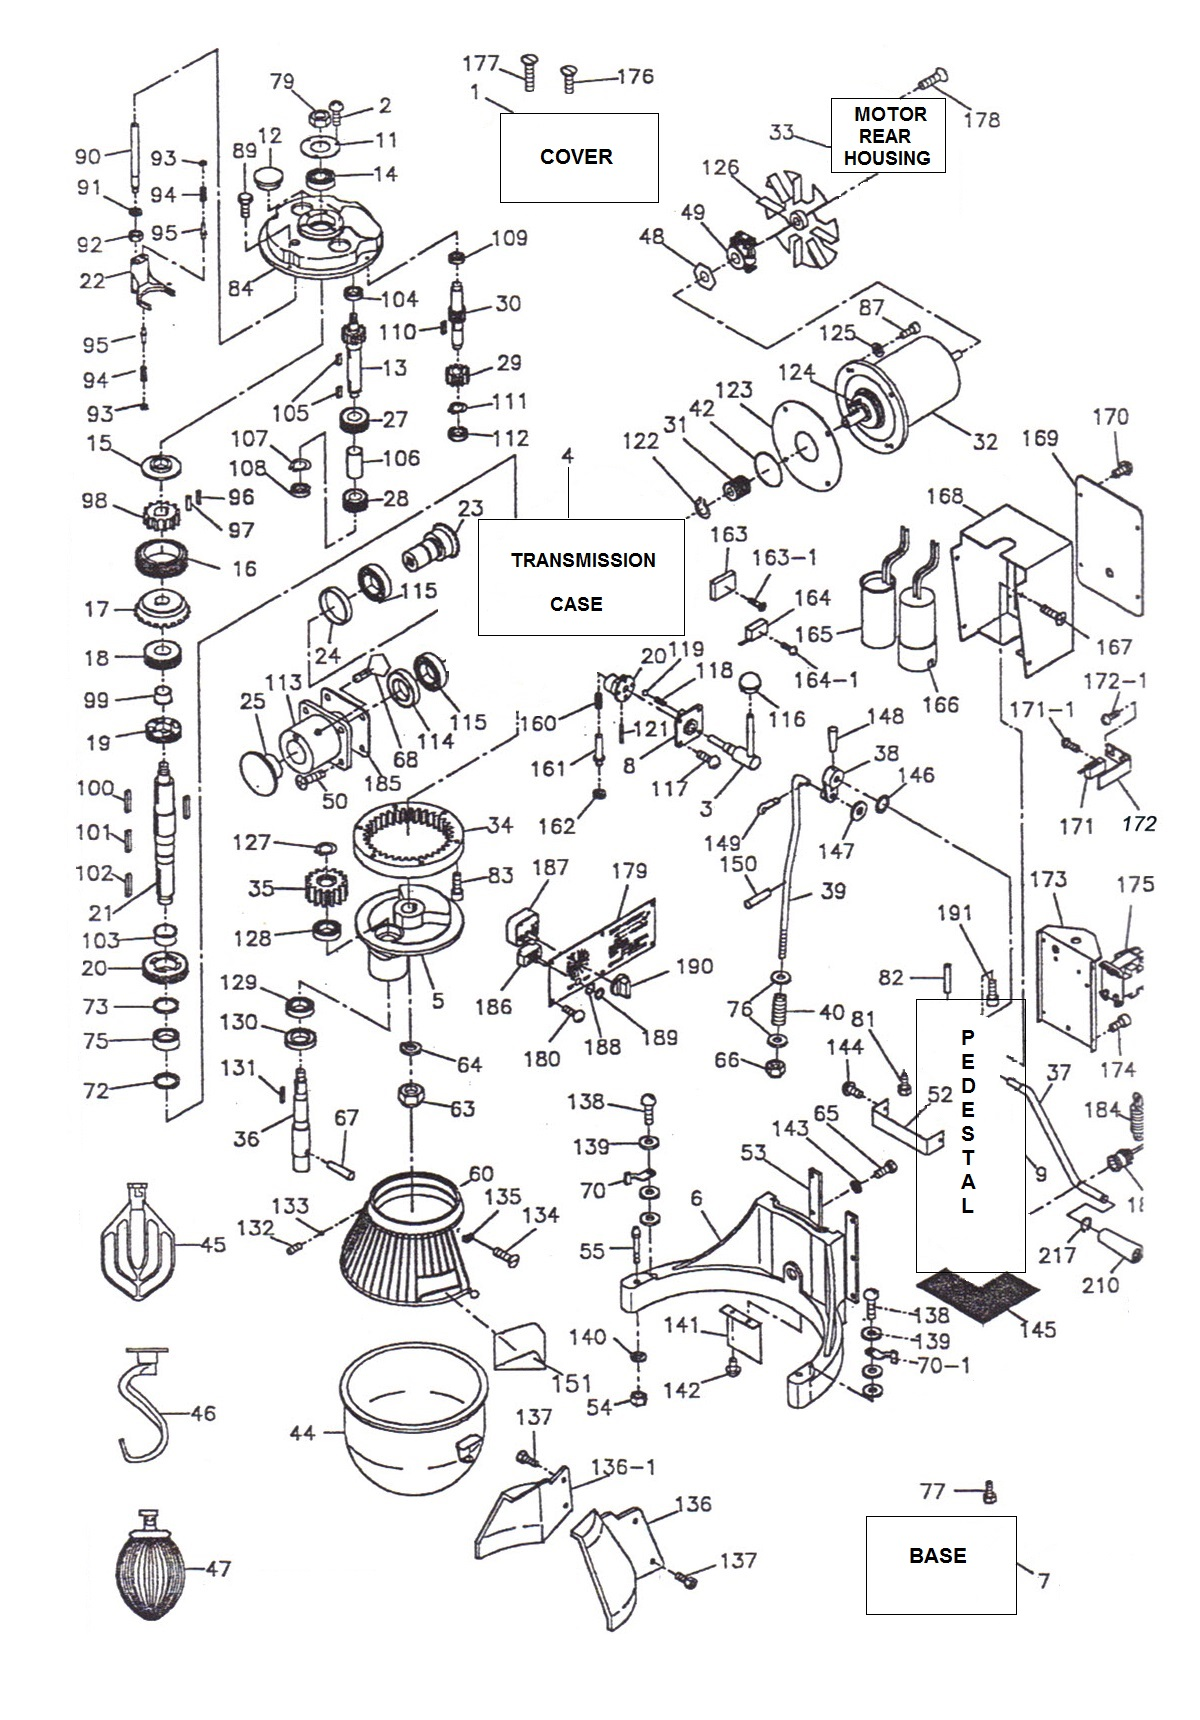 Wiring Diagram Hobart A 200 Mixer